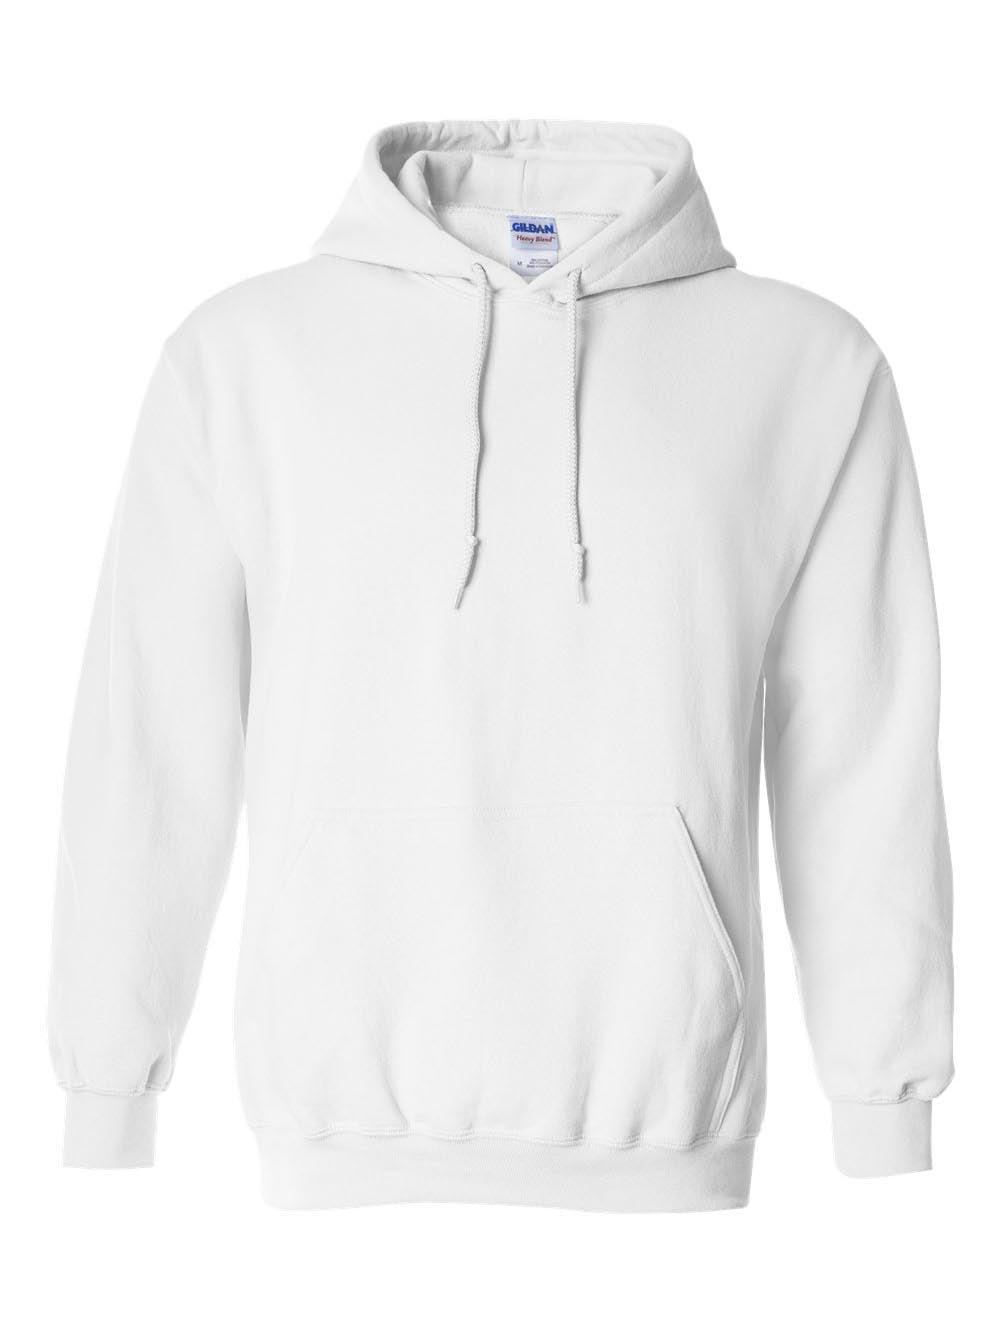 Like-Art Sweatshirt Basketball US Heavy Blend Double-Lined Front Pouch Pocket